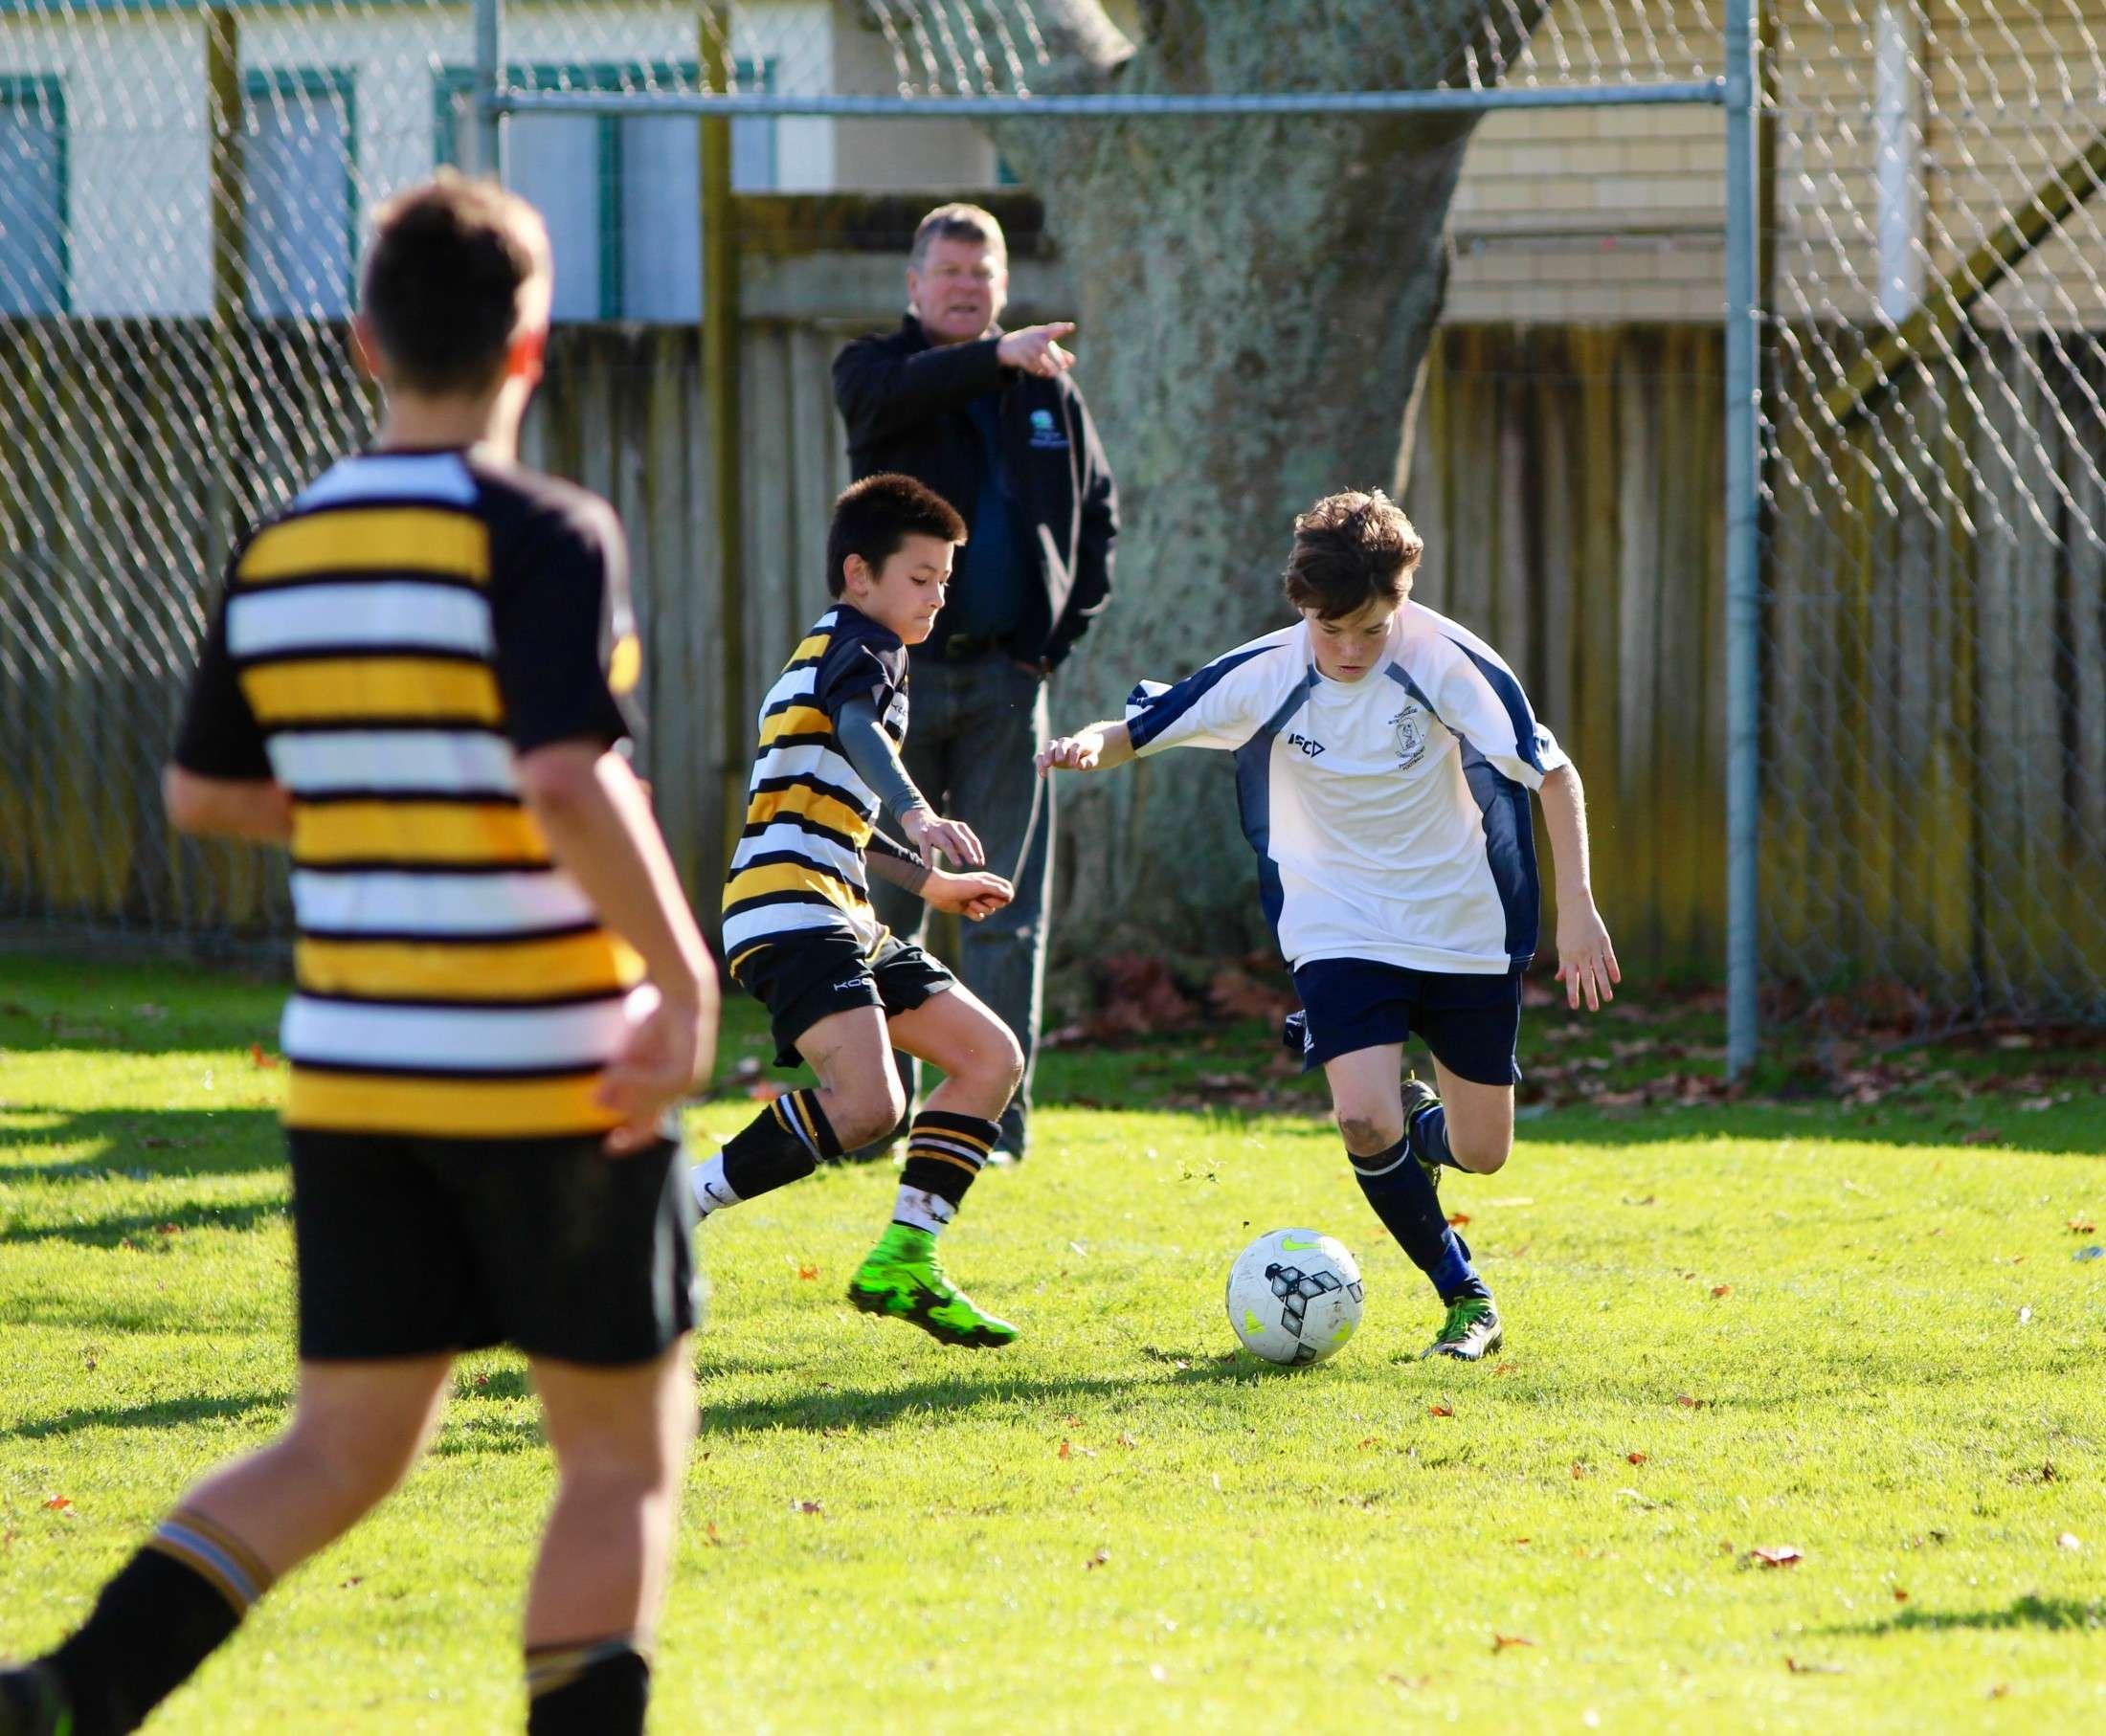 Football - How to get involved - Titan Sports  -  Tauranga Boys' College